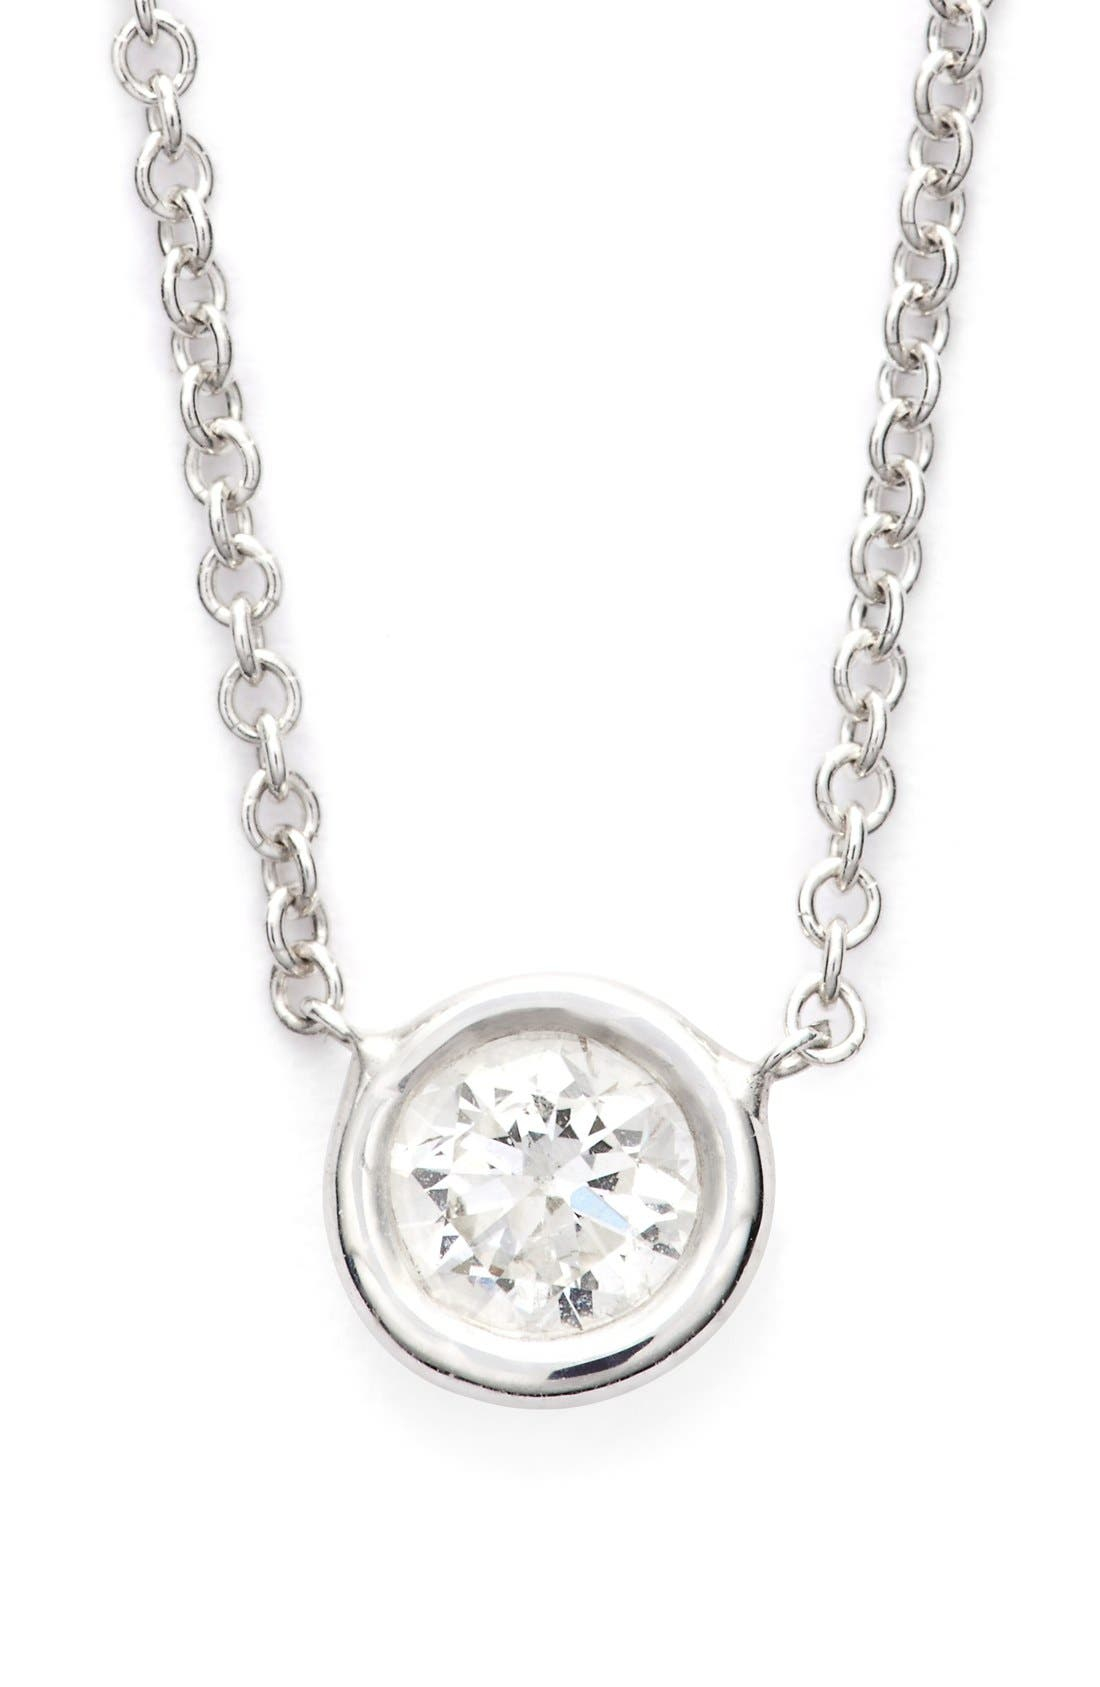 Medium Diamond Solitaire Pendant Necklace,                         Main,                         color, White Gold